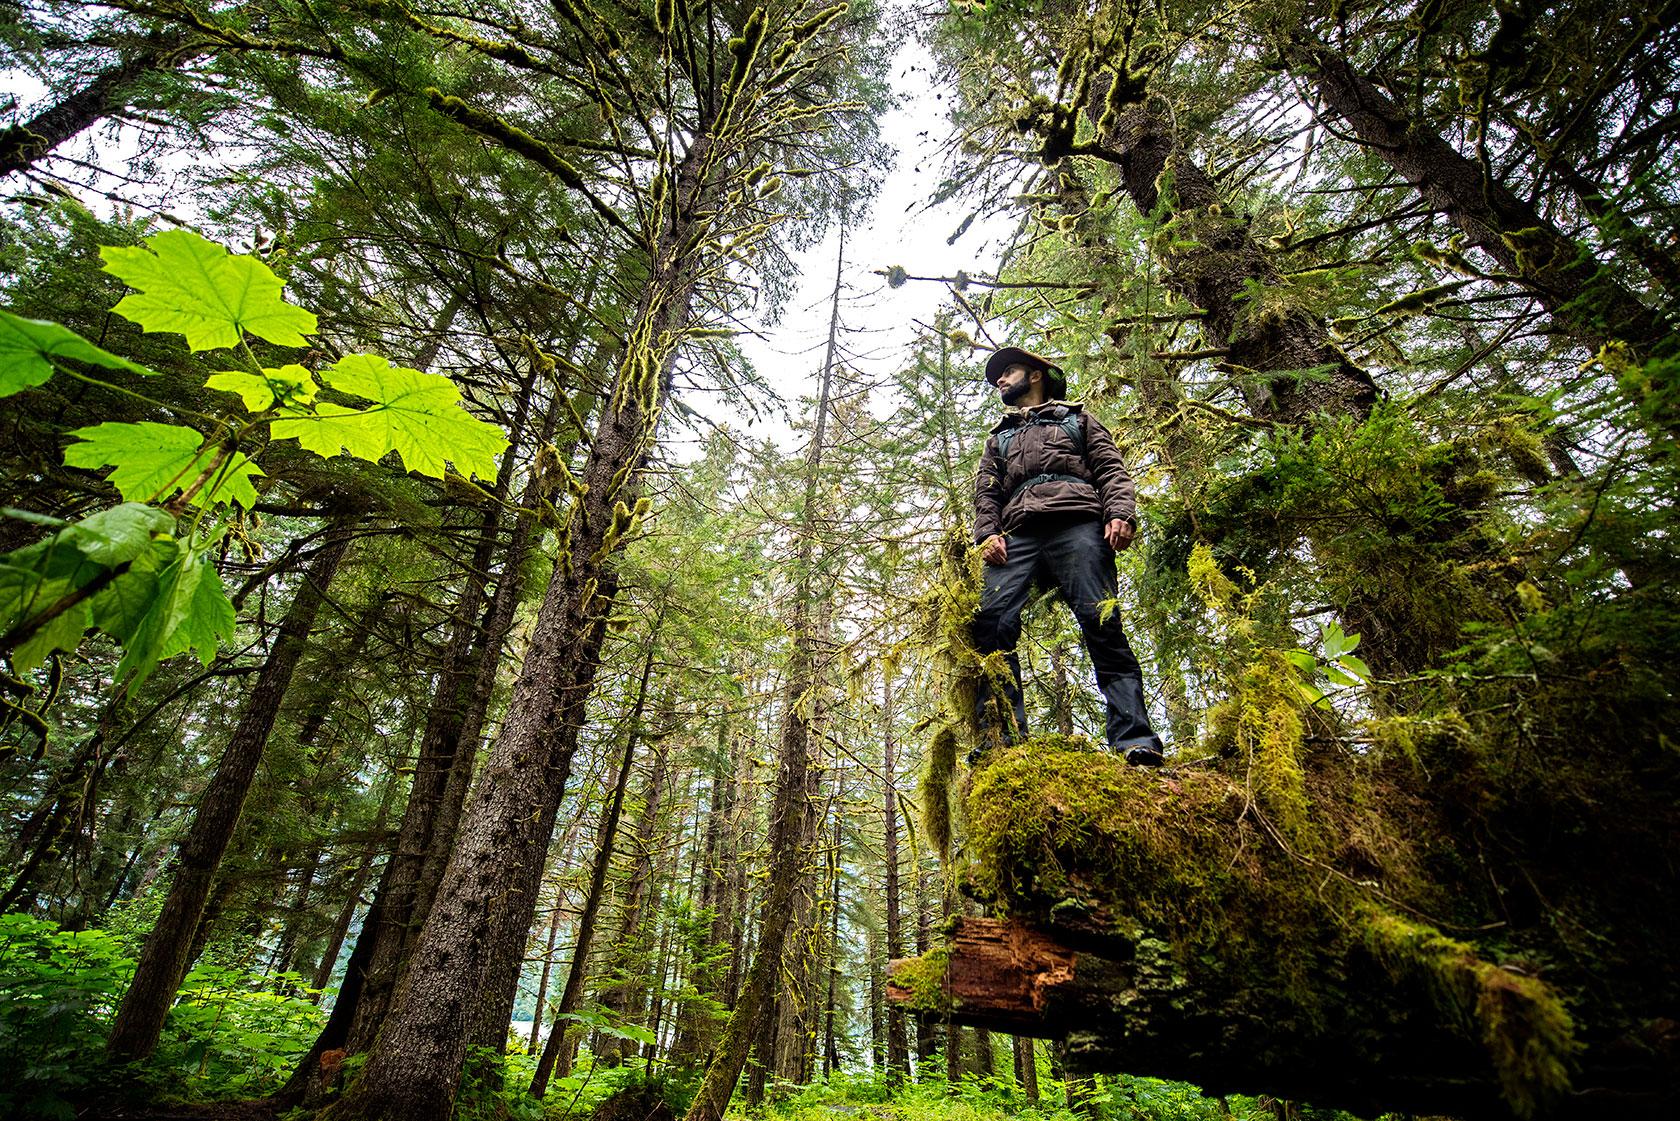 austin-trigg-brave-wilderness-alaska-BW-Coyote-Stands-on-Log-Salmon-Hole.jpg